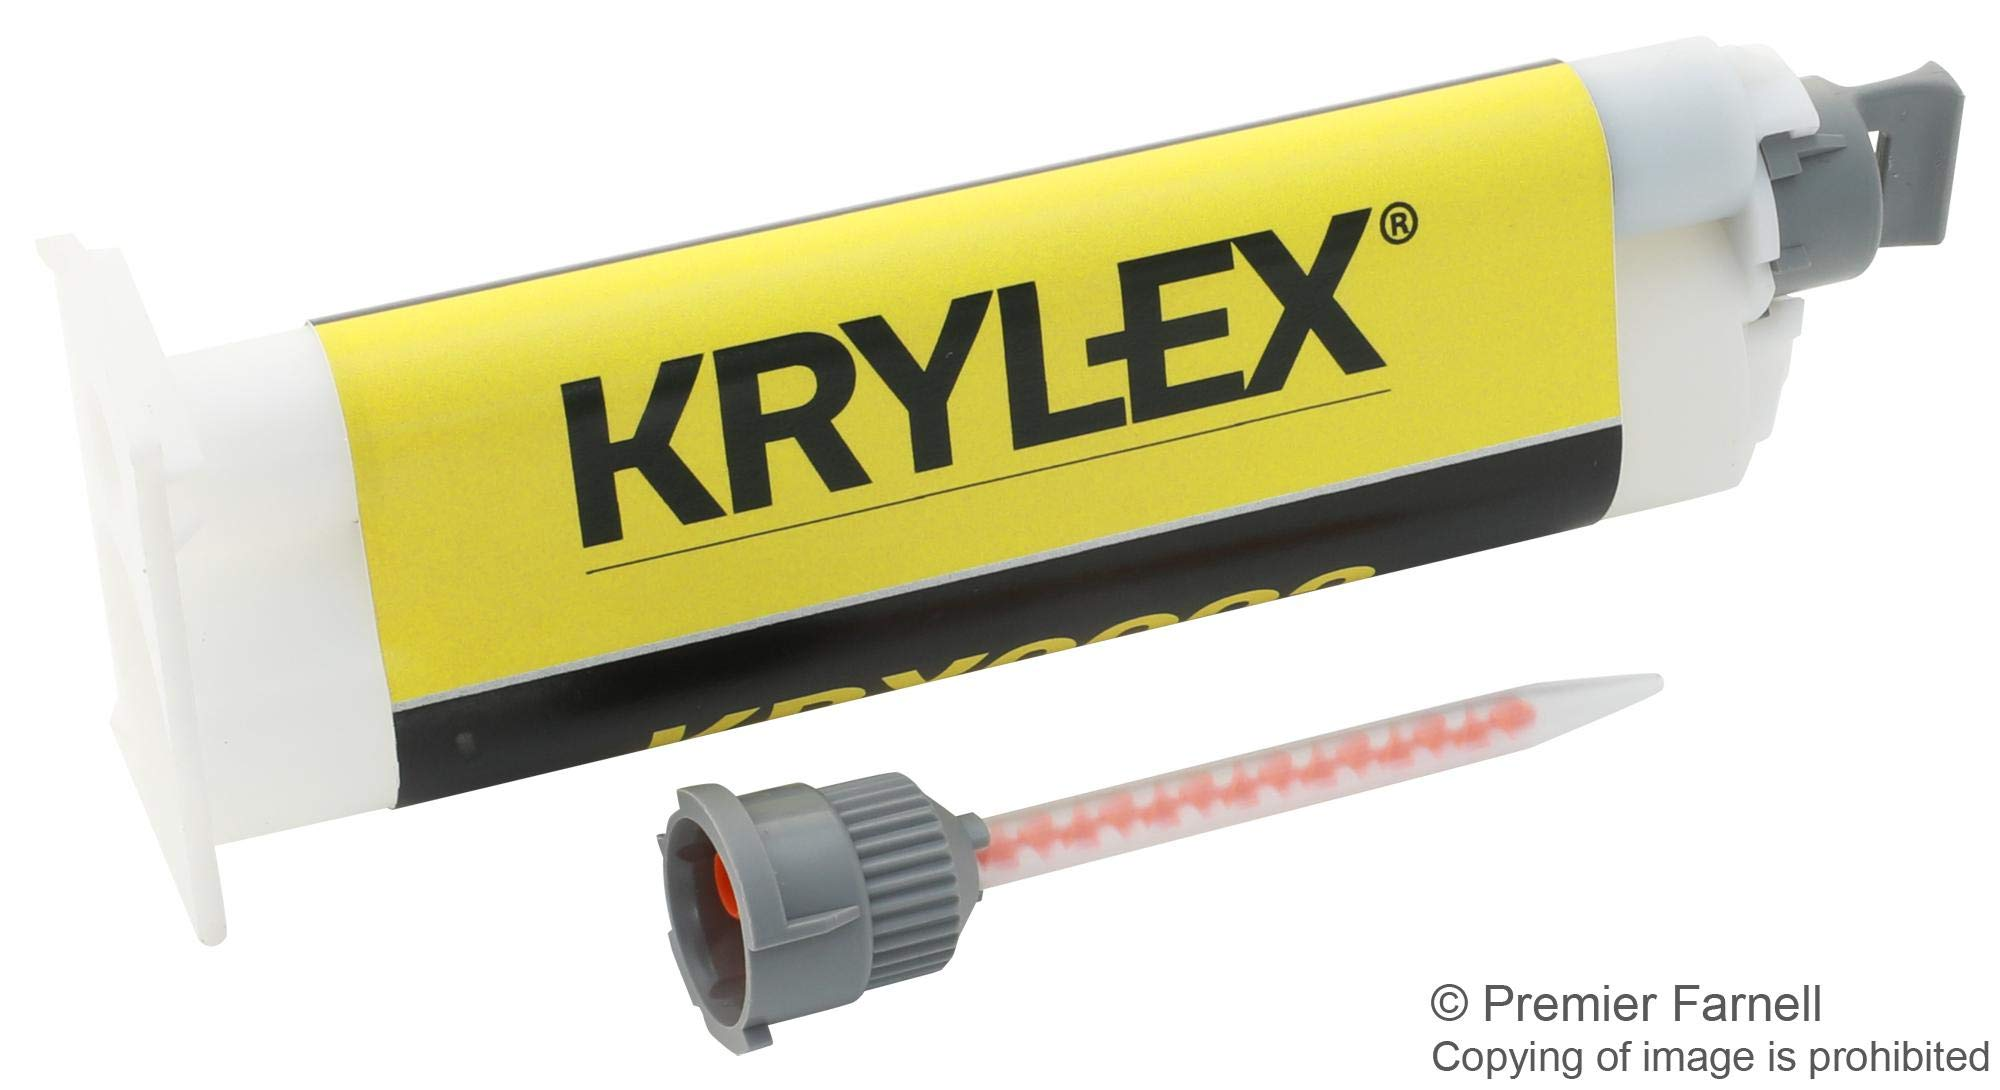 KBX0904, 50G - INSTANT ADHESIVE, CYANOACRYLATE, 50G (Pack of 2) (KBX0904, 50G)